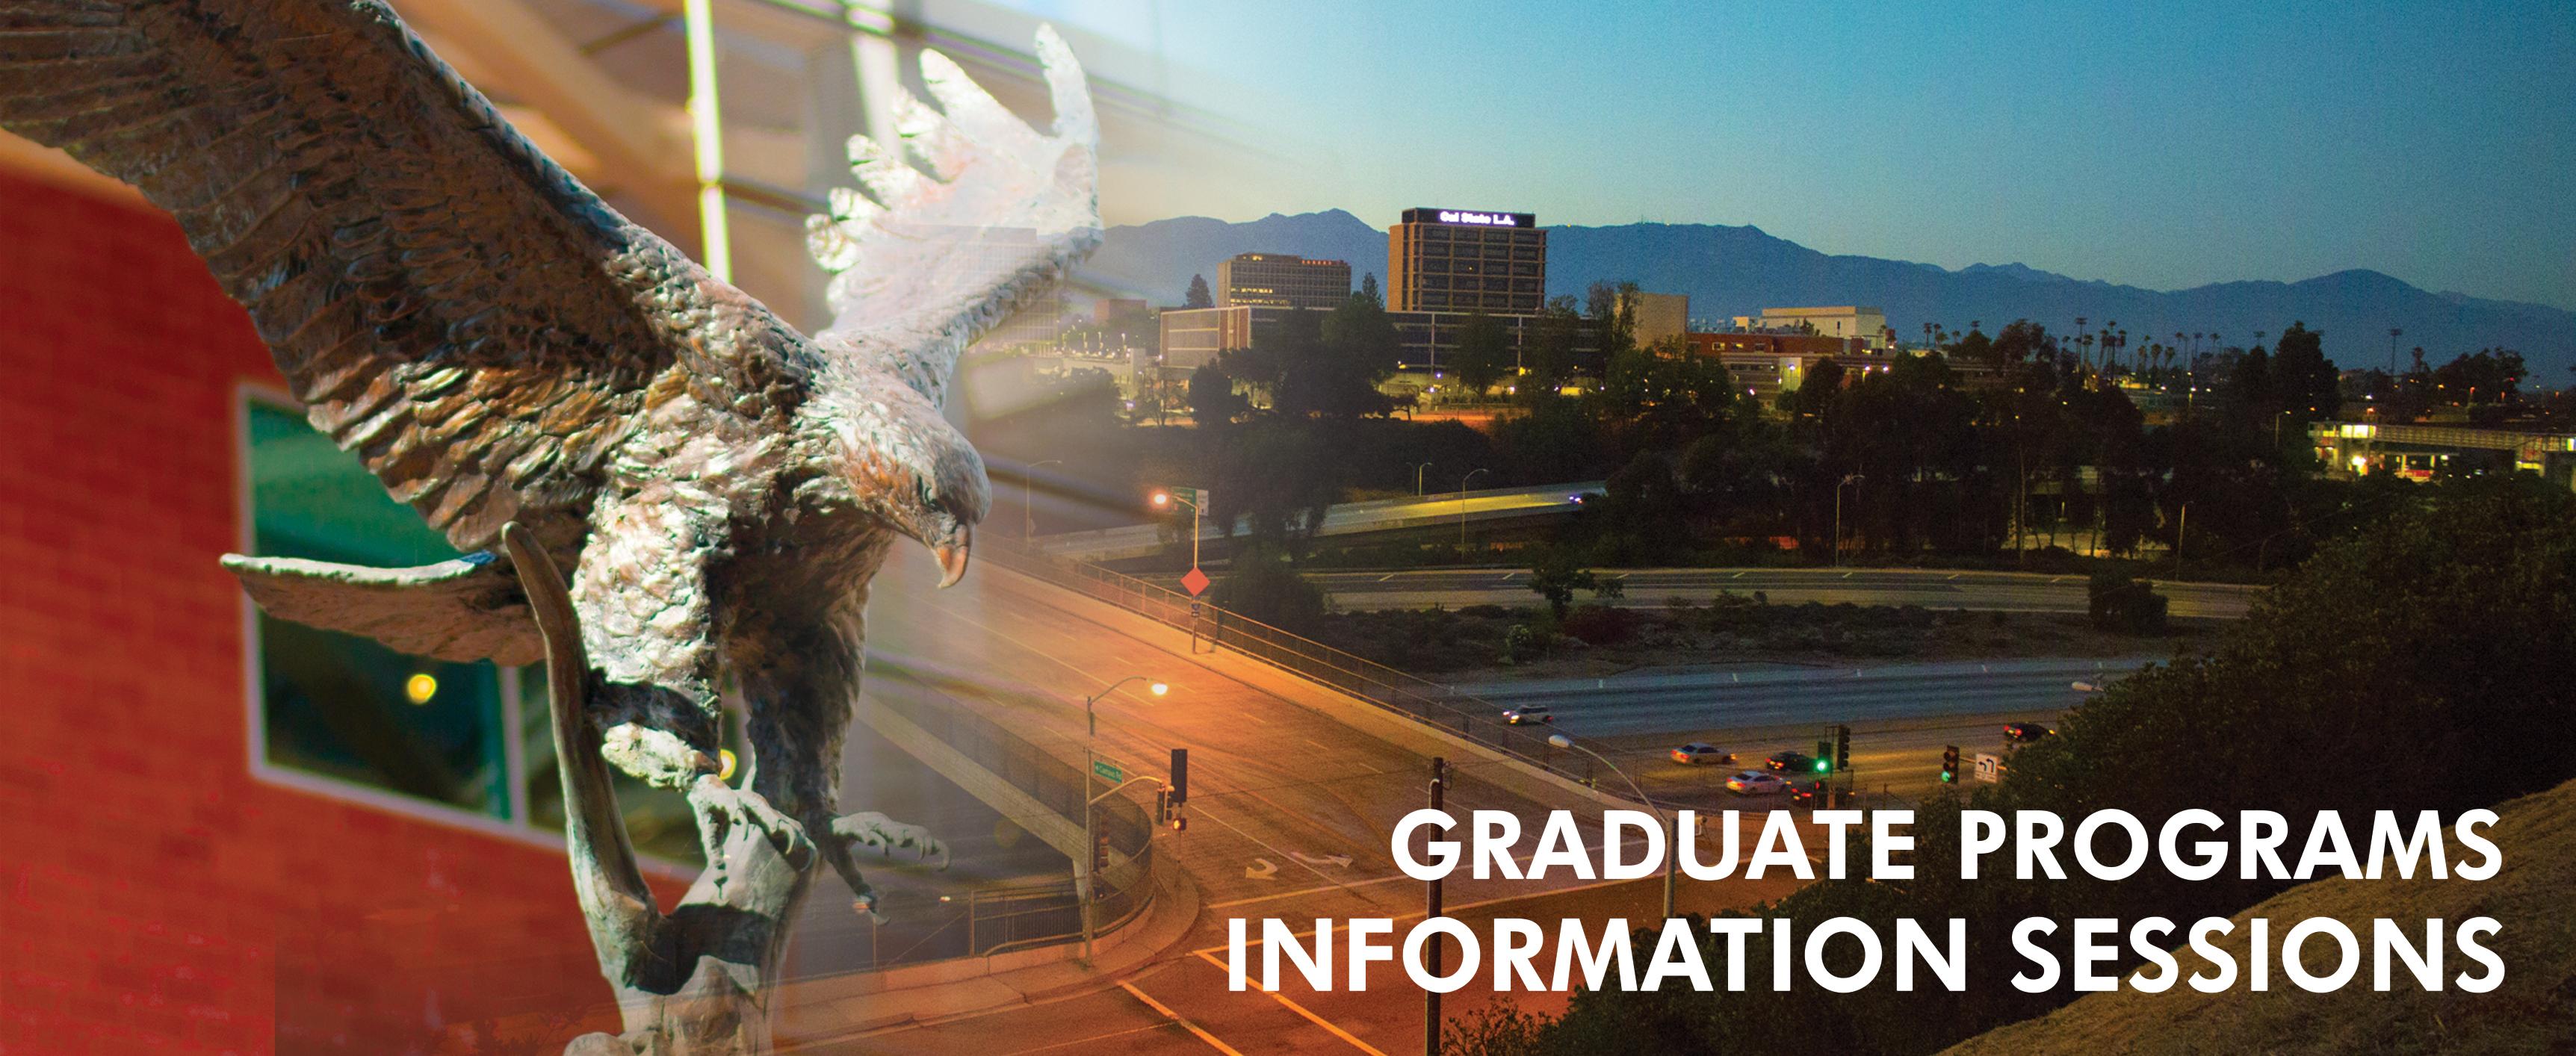 Graduate Program Information Session